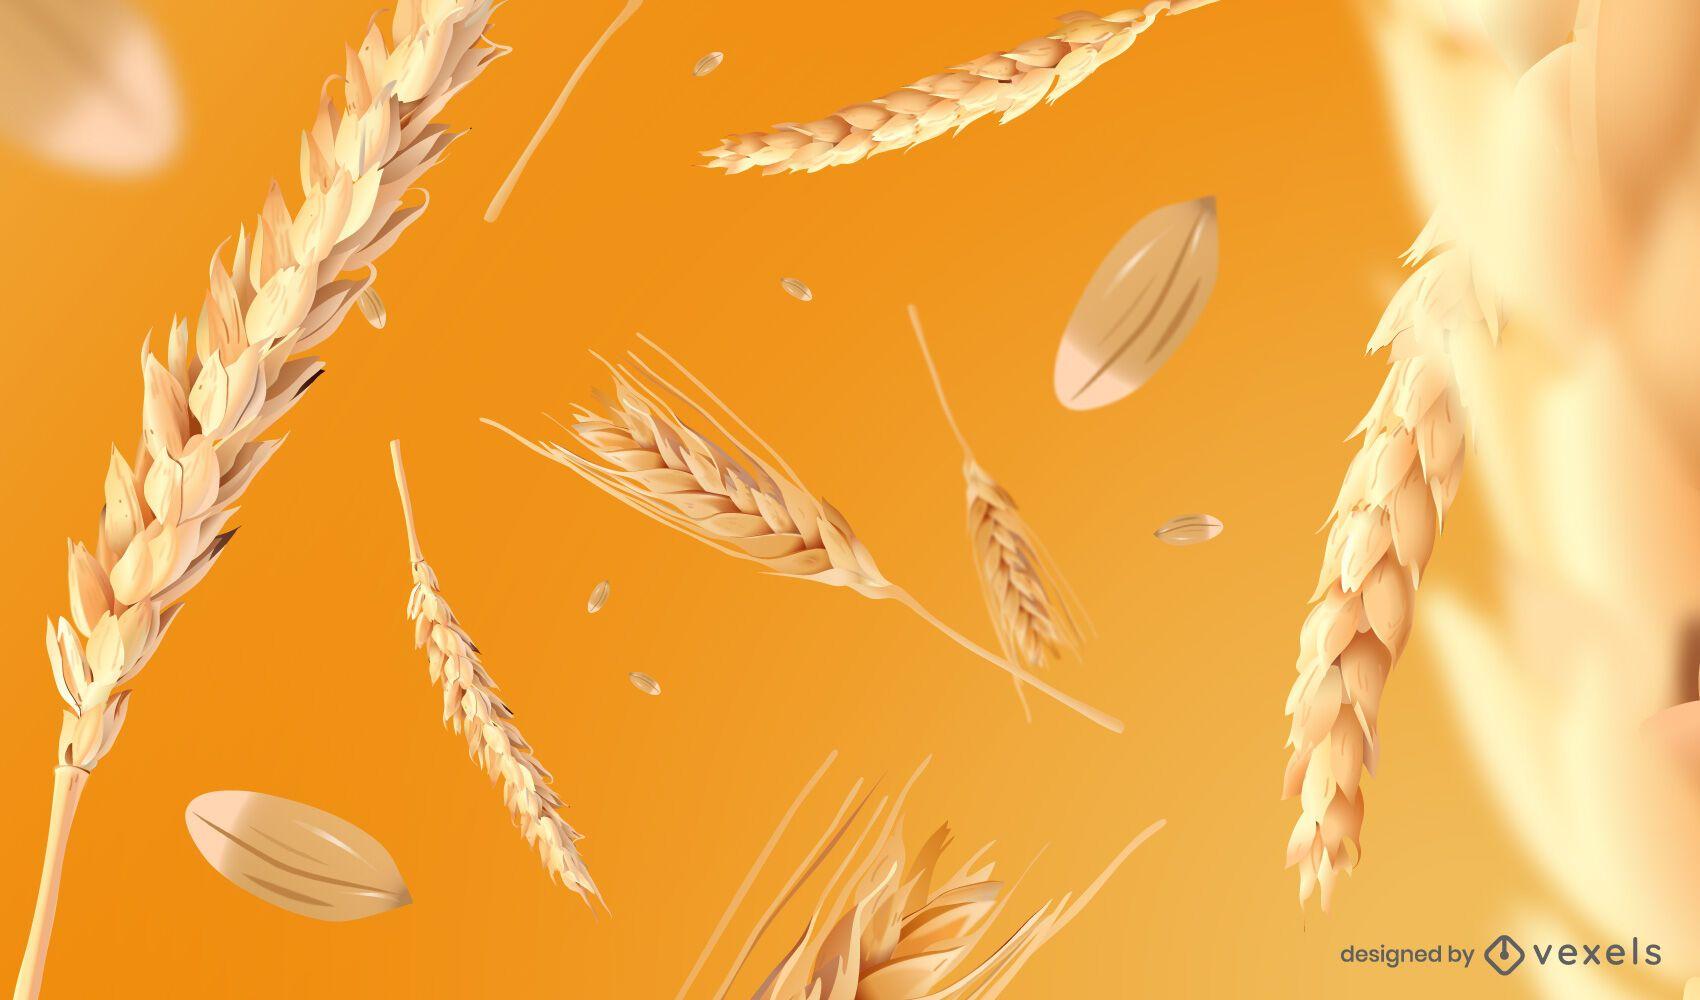 Wheat spikes background design